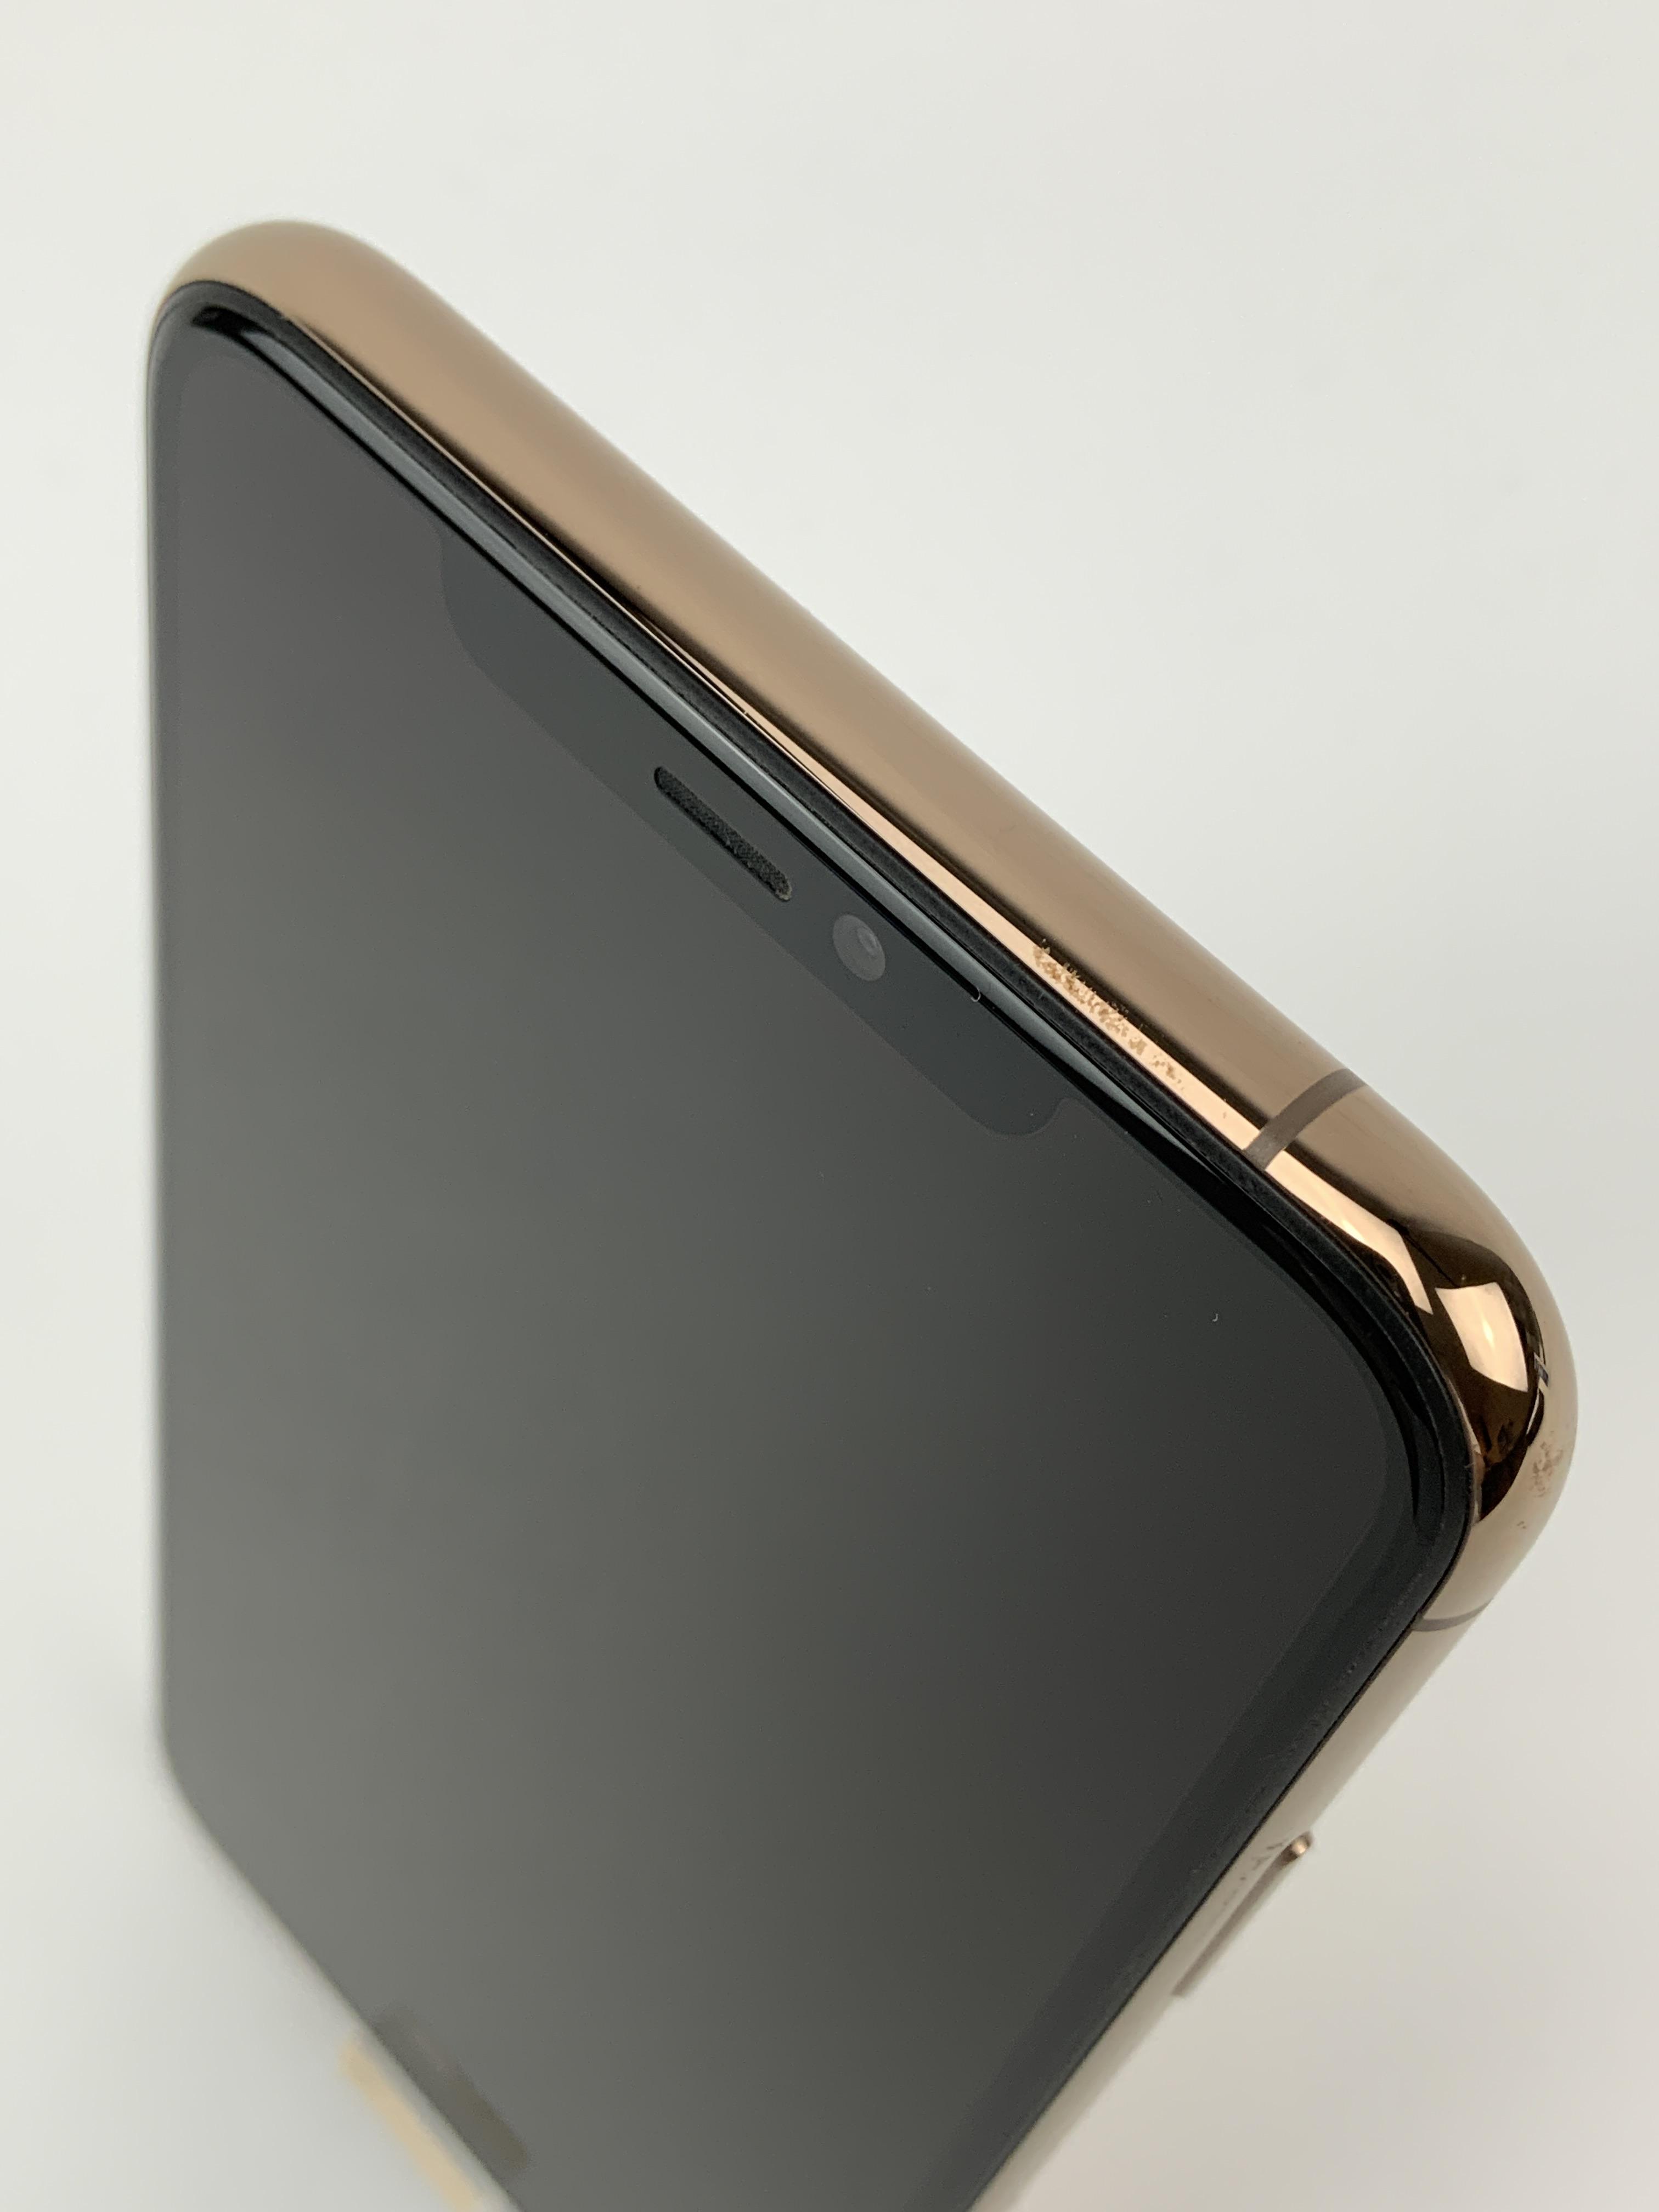 iPhone 11 Pro Max 64GB, 64GB, Gold, Bild 3